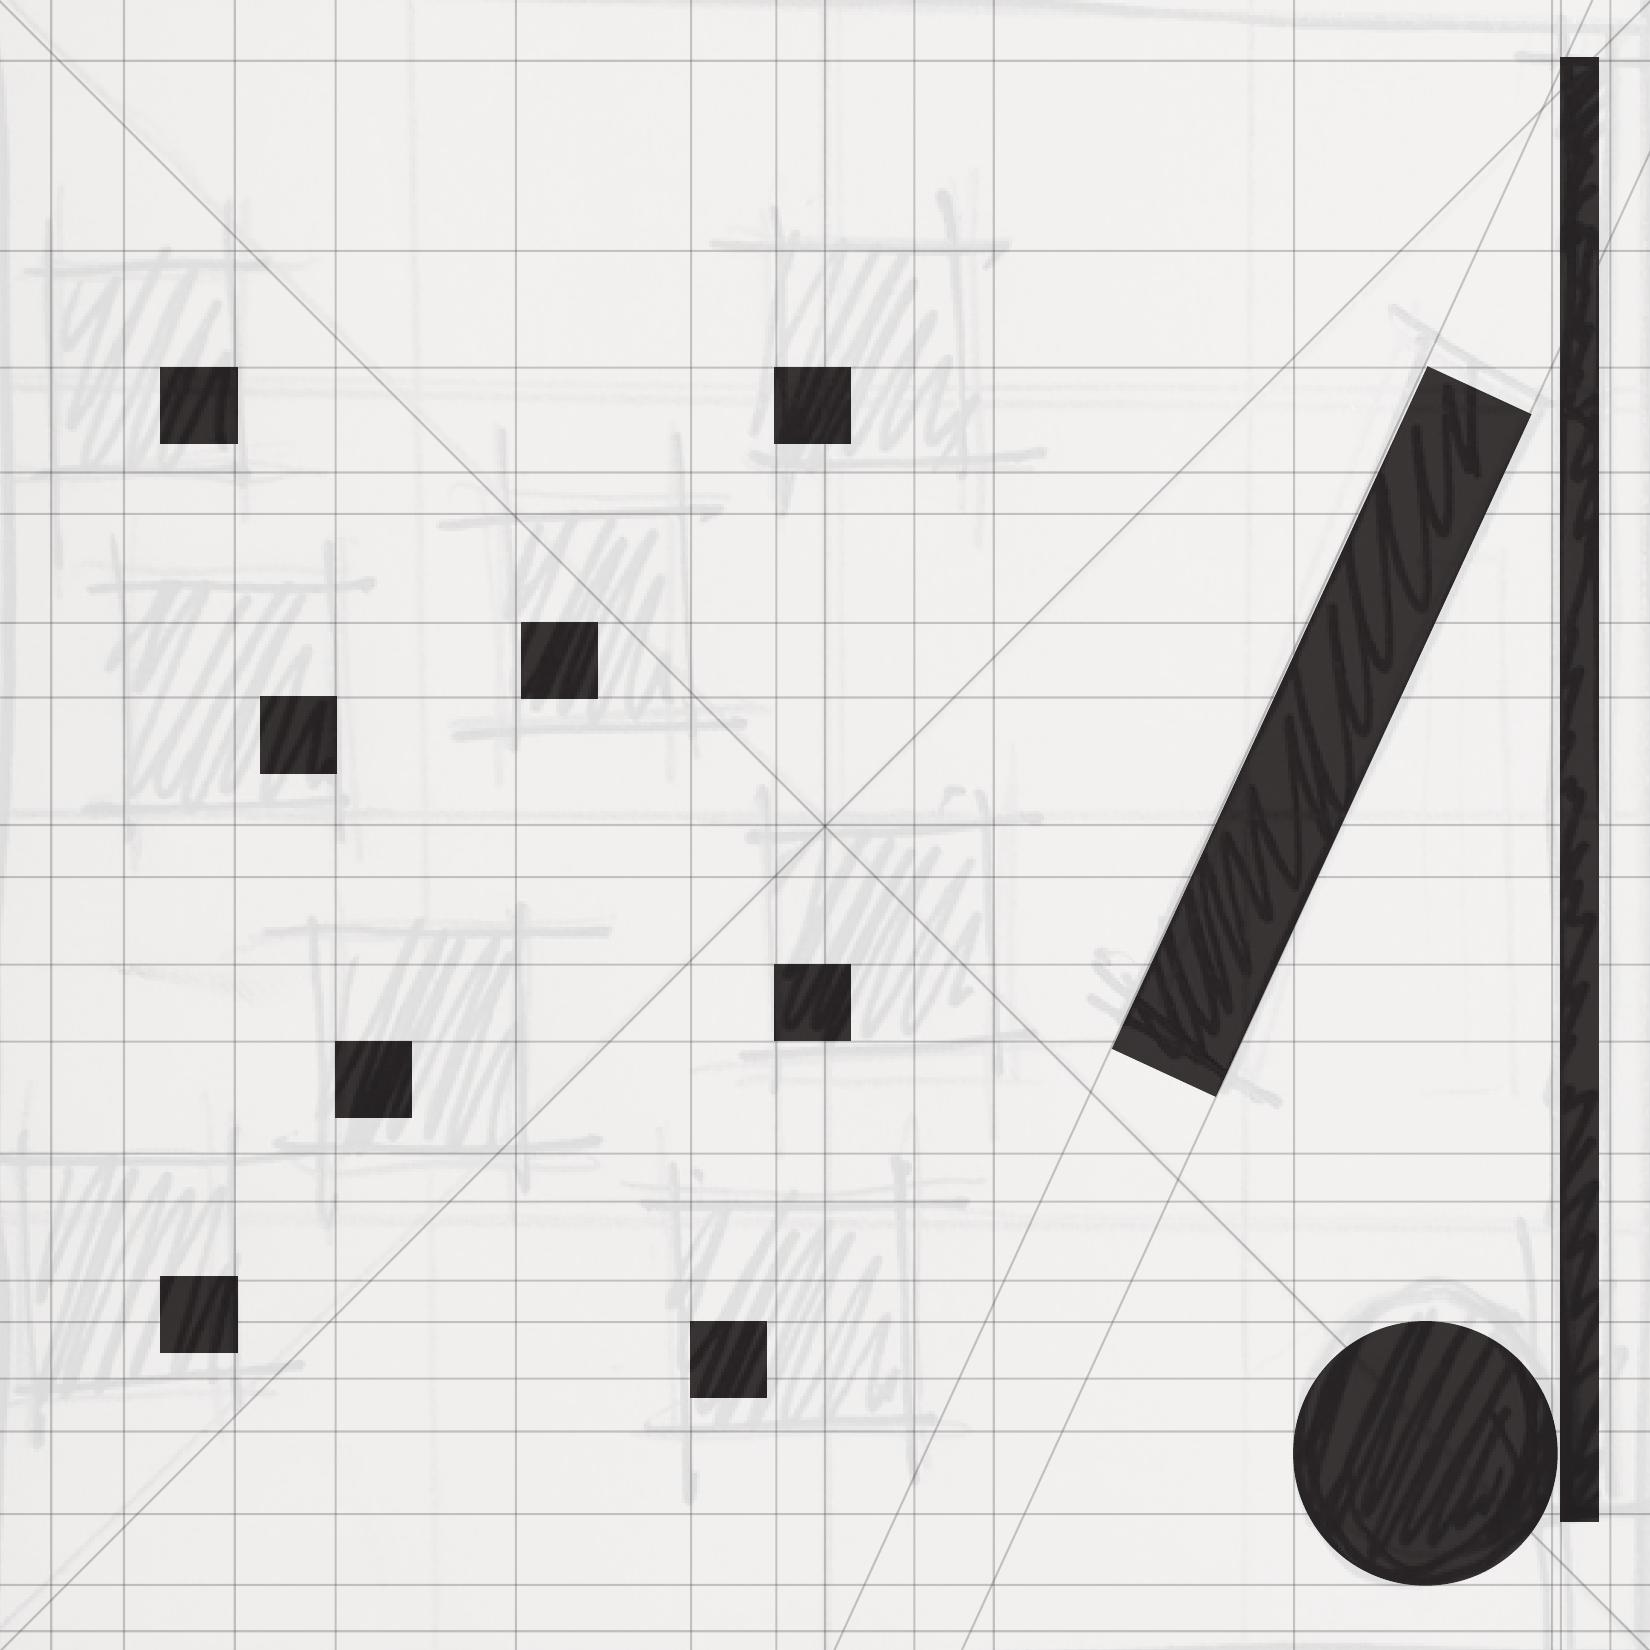 Assignment5_process1_#1_regressive_shapes.lines.underlay_000001.jpg